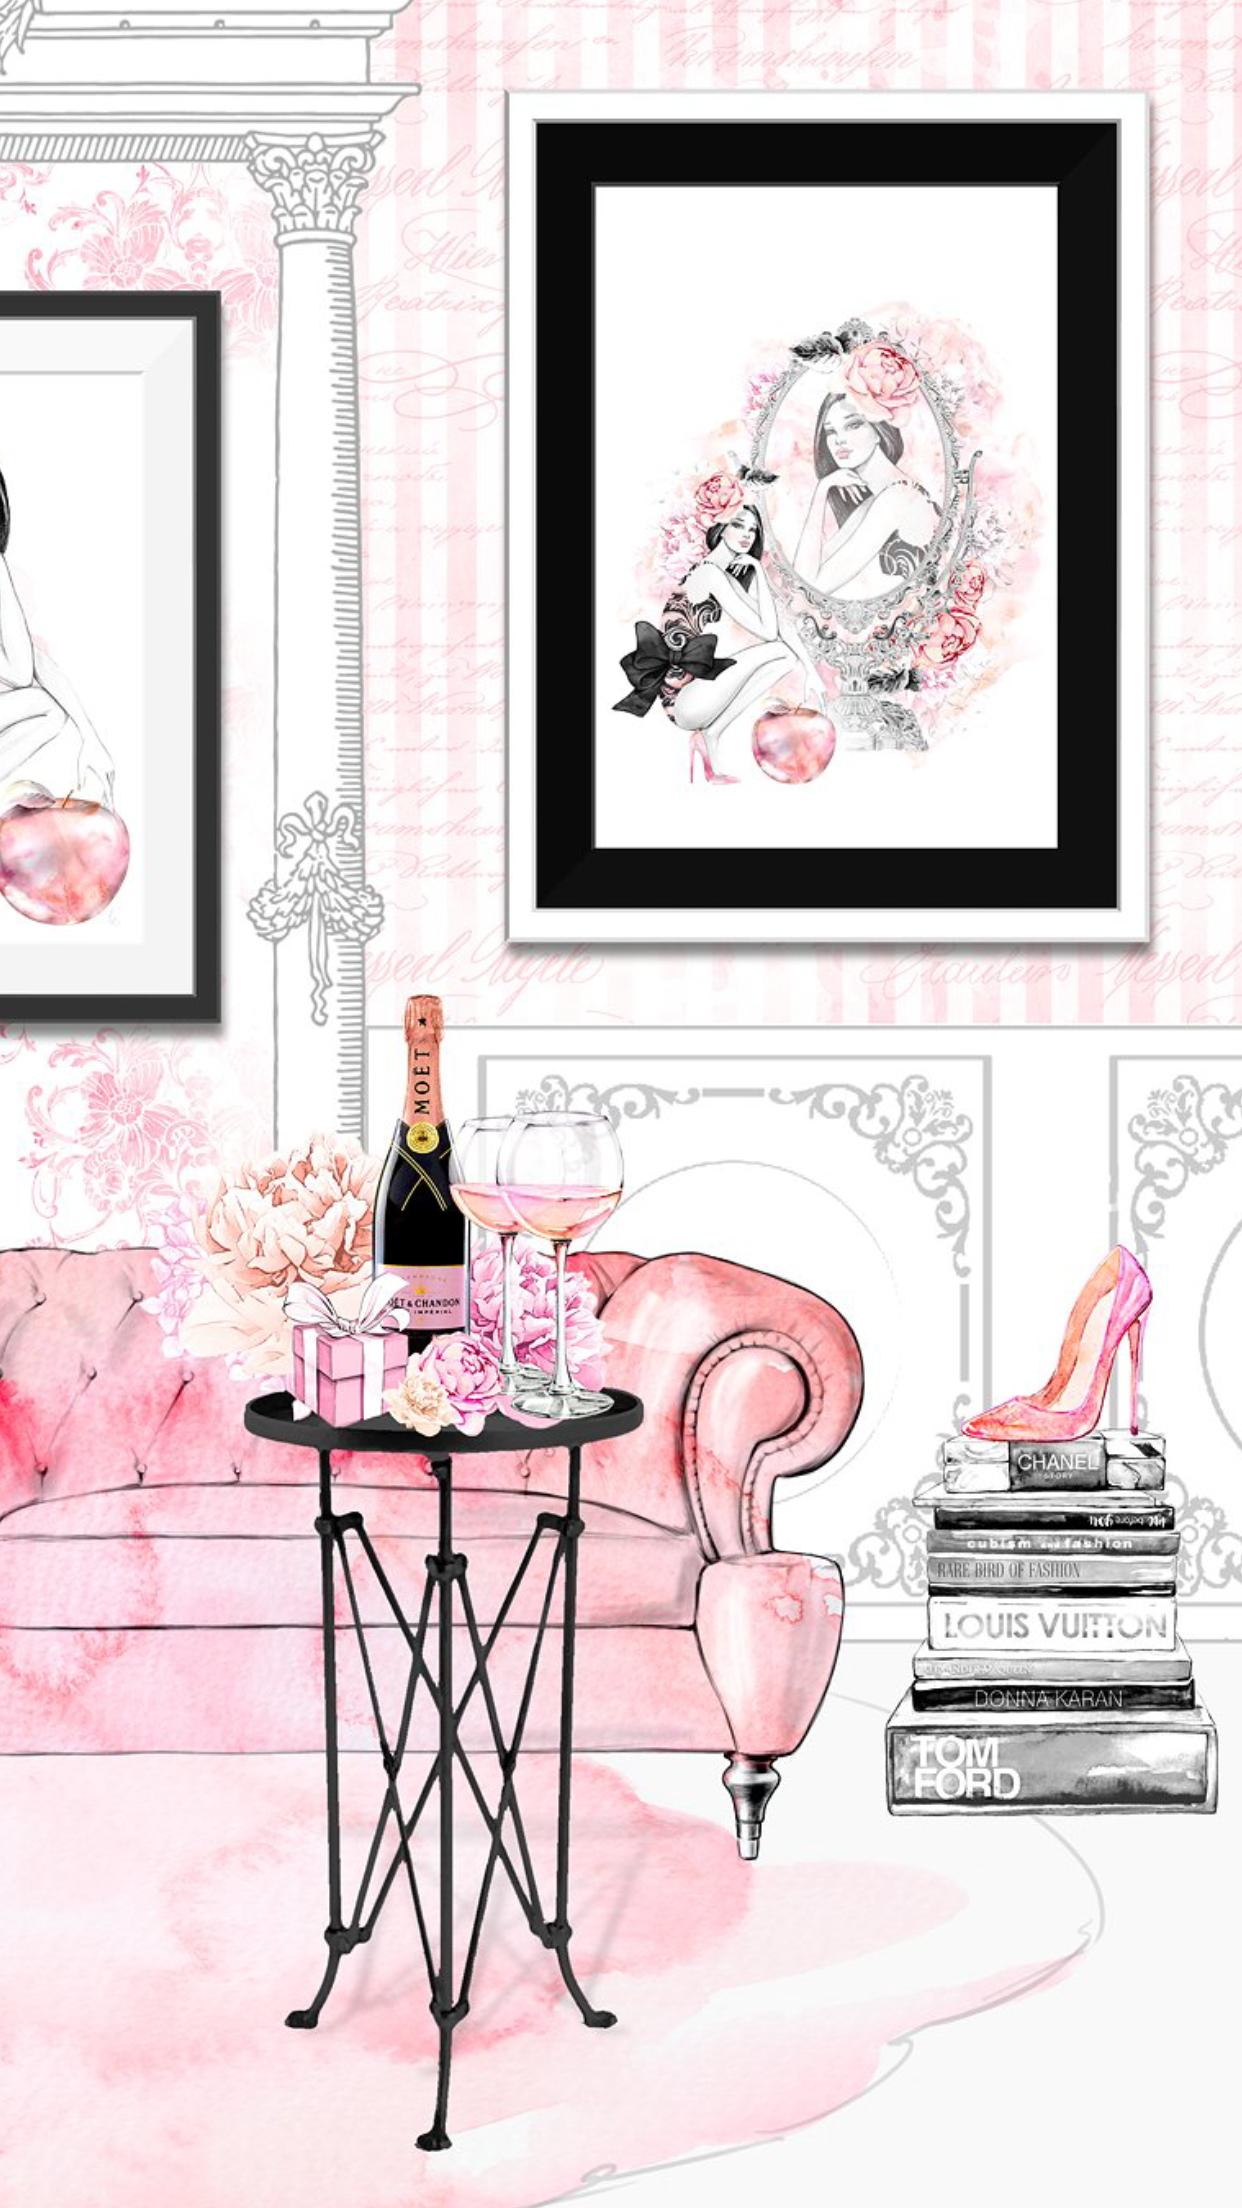 W.PHONE* ** * Fashion wallpaper, Megan hess illustration